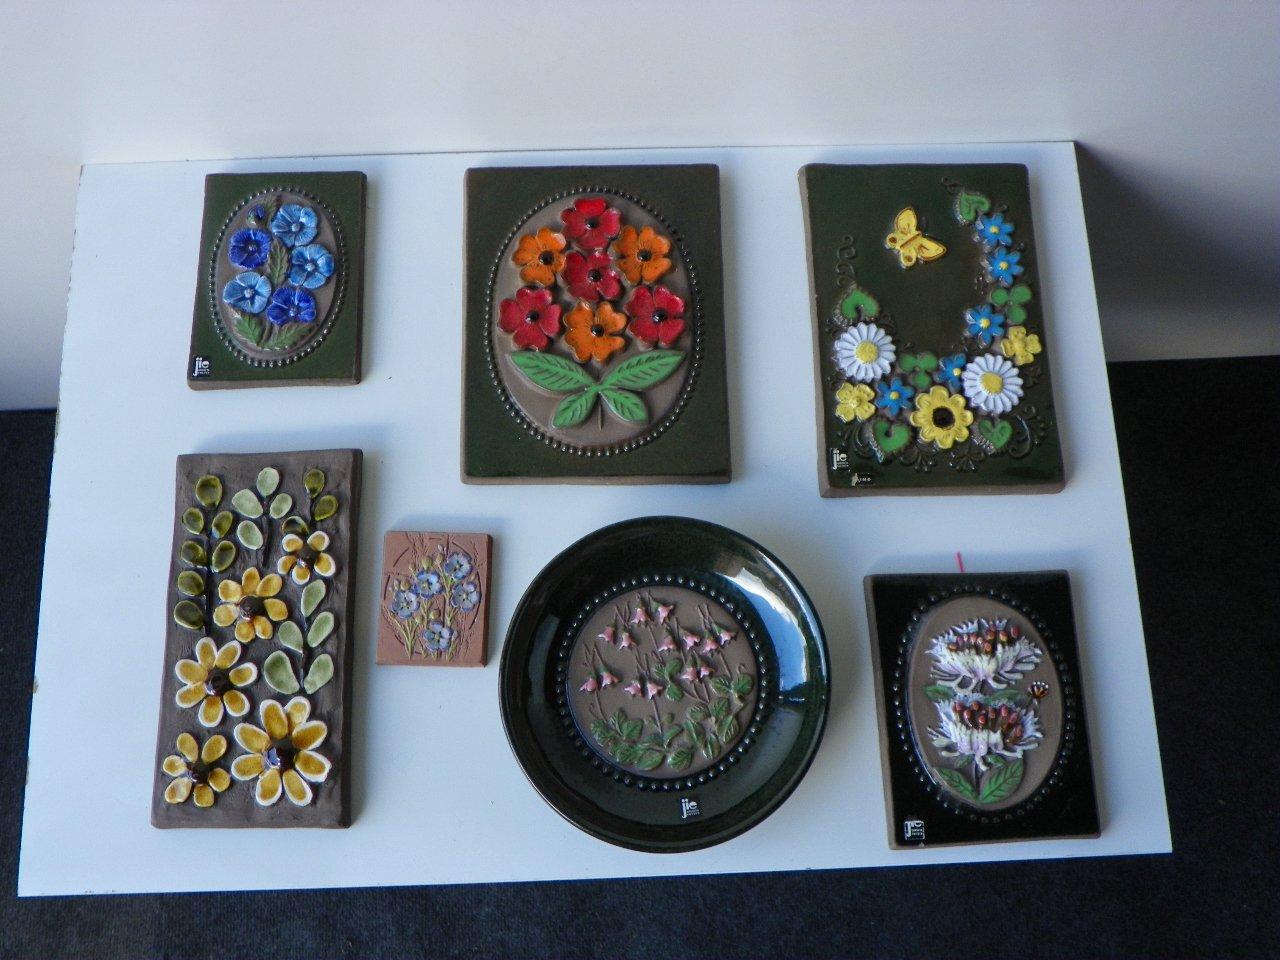 Mattonelle vintage di jie gantofta keramik sweden set di 7 in